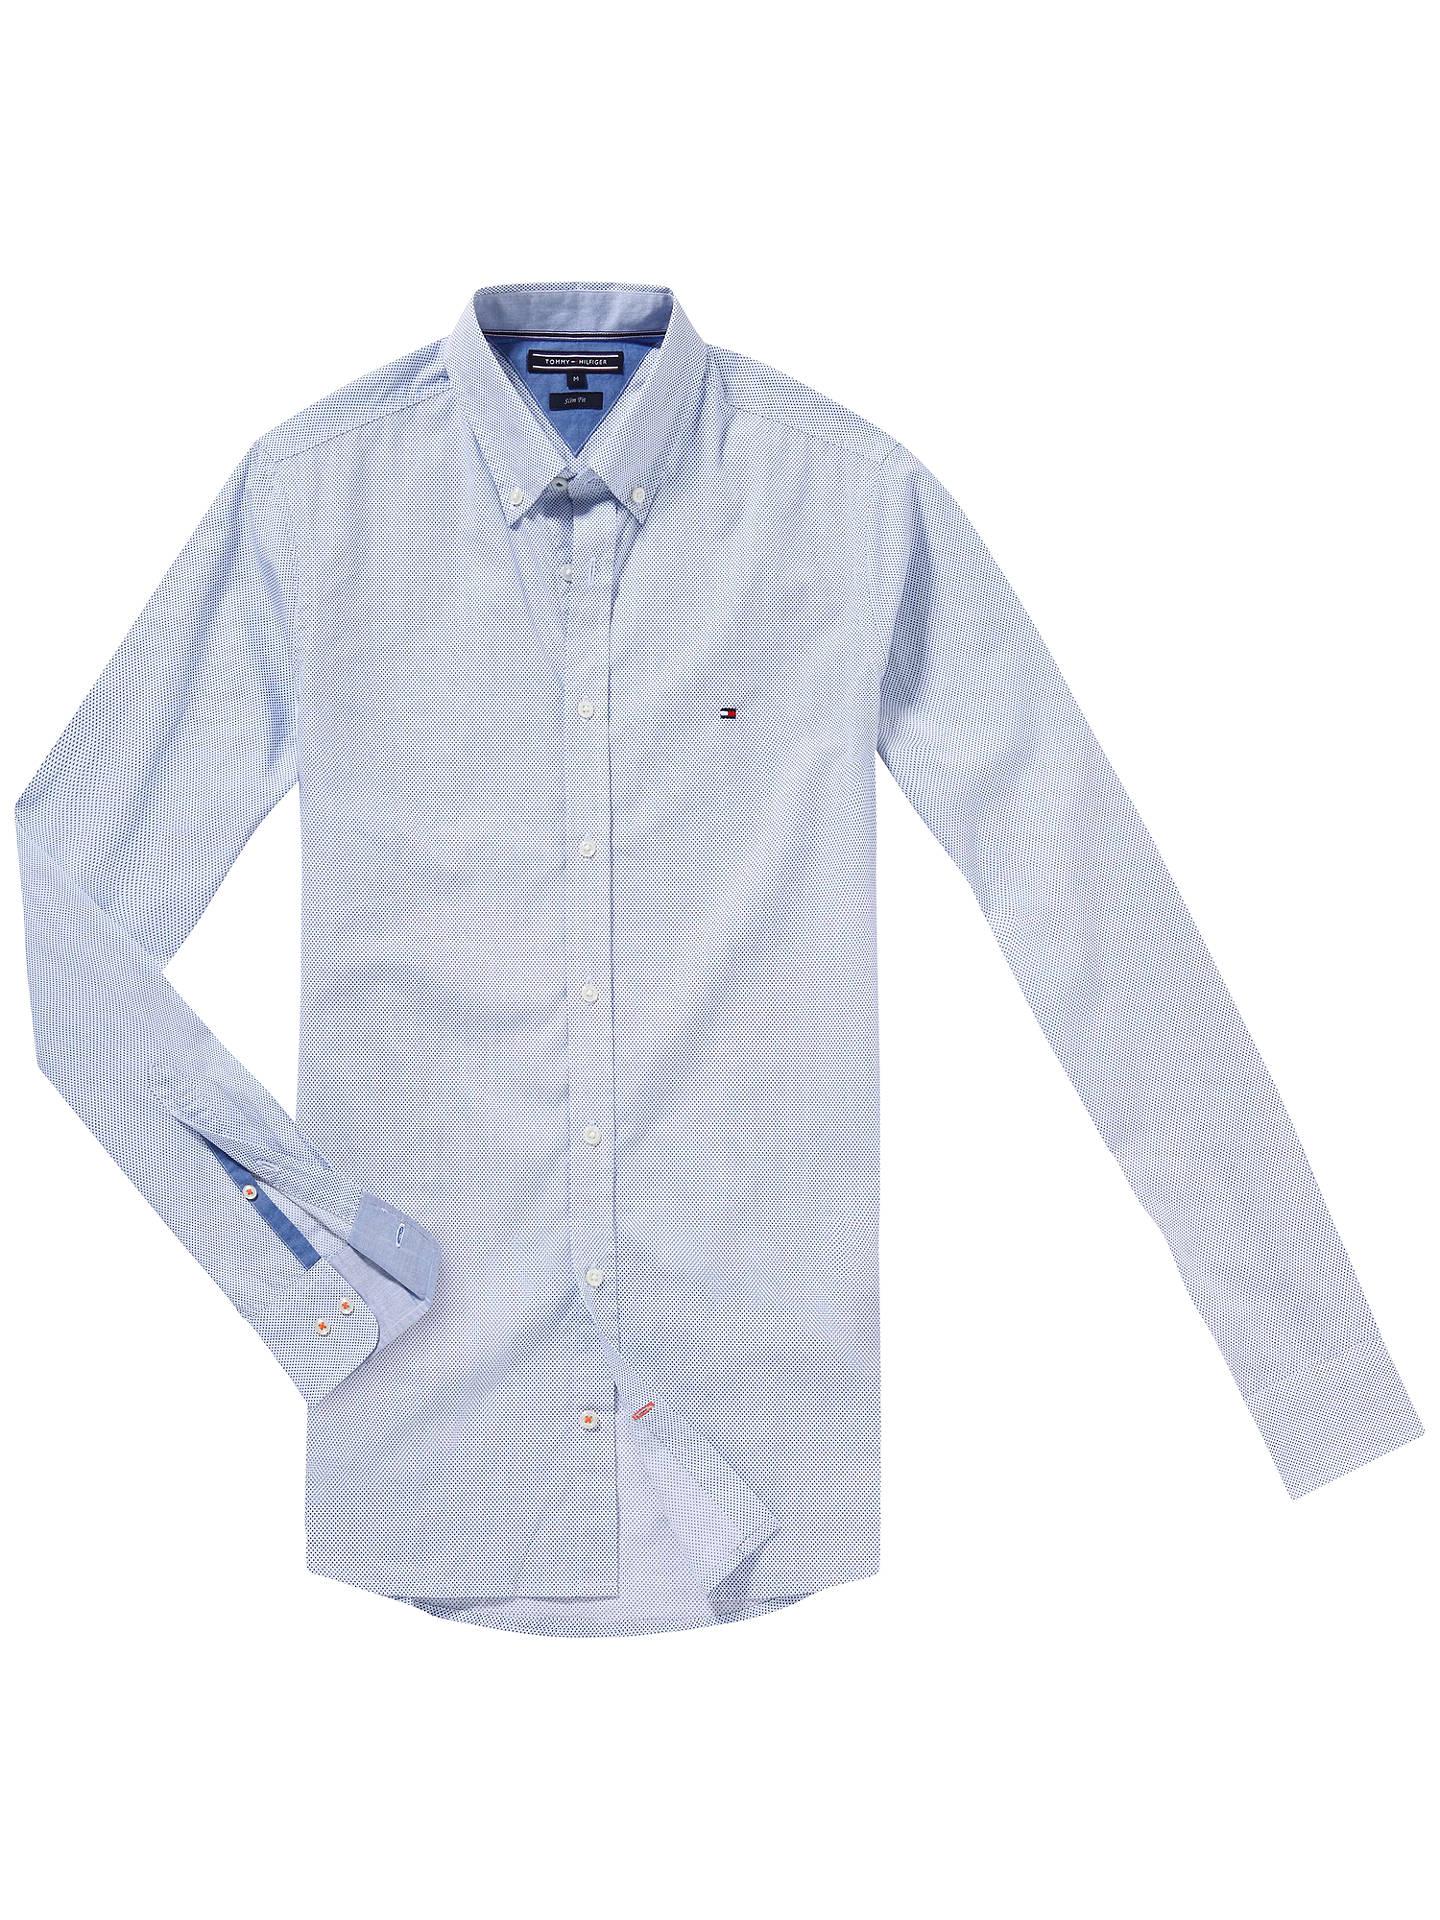 1590727a79e Buy Tommy Hilfiger Square Print Slim Fit Shirt, Classic White/Monaco Blue, M